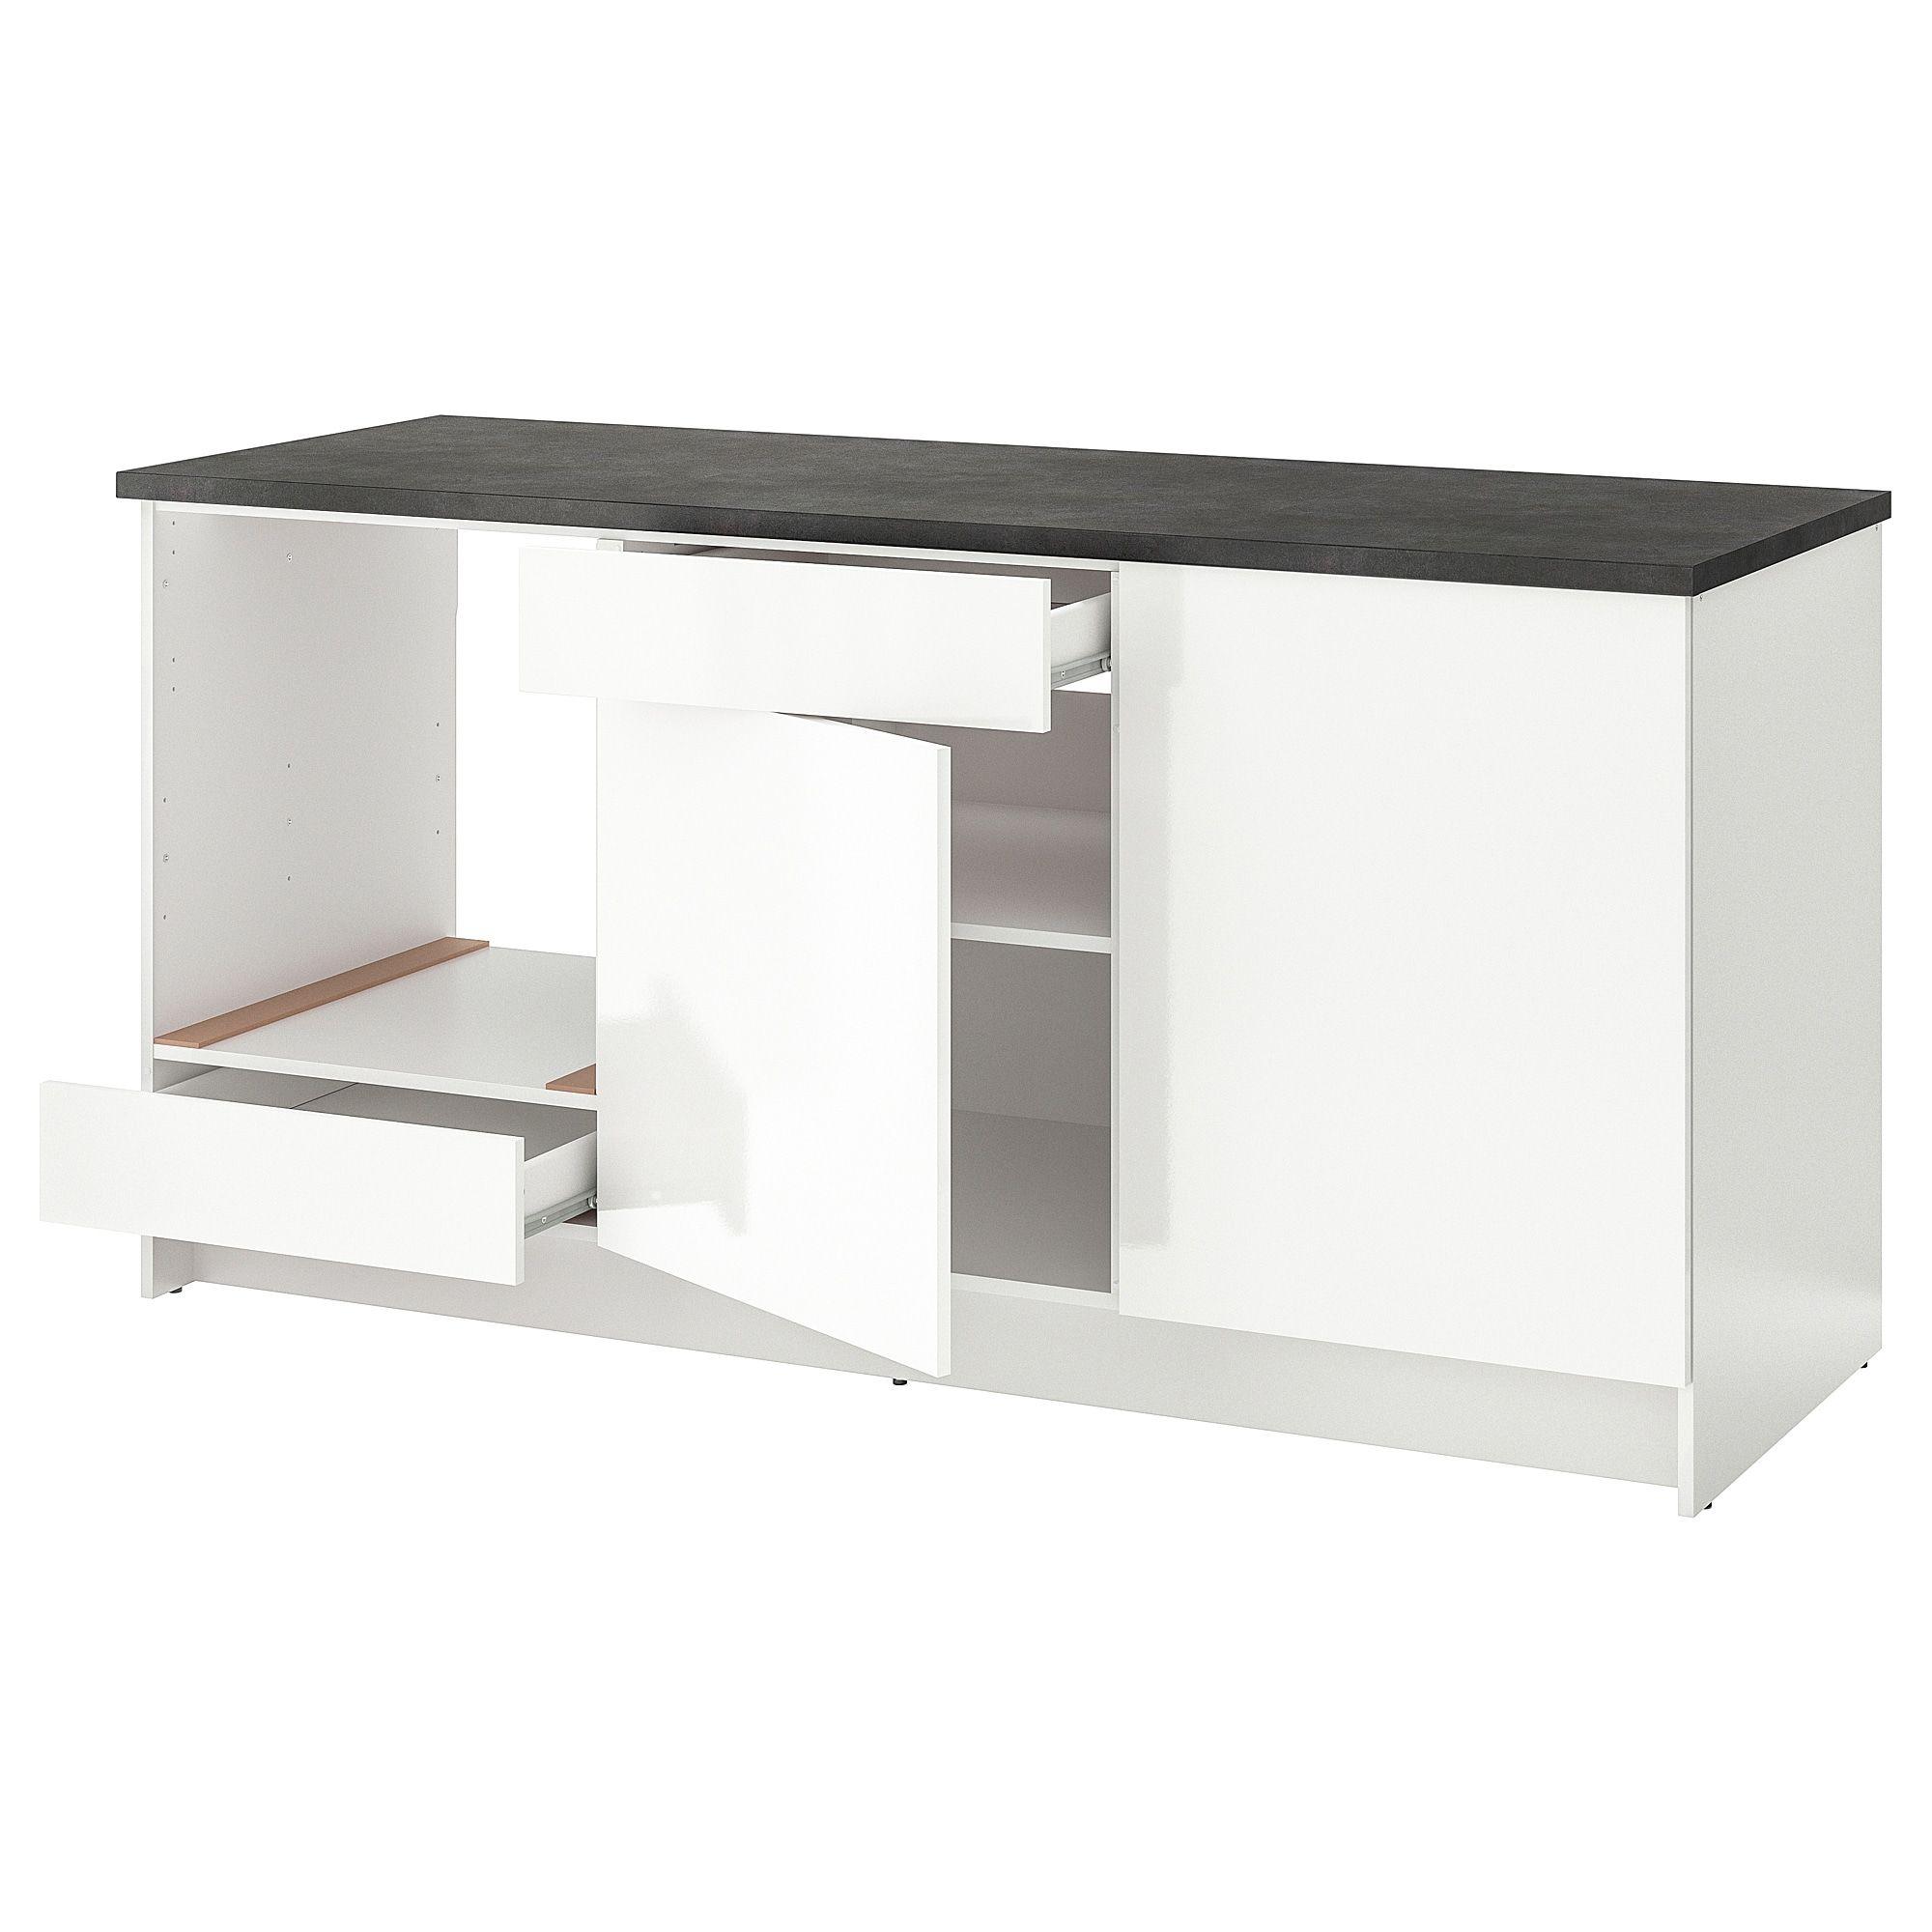 Full Size of Ikea Singleküche Knoxhult Unterschrank Mit Tren Schublade Hochglanz Wei Sofa Schlaffunktion Betten Bei Miniküche E Geräten Kühlschrank 160x200 Küche Wohnzimmer Ikea Singleküche